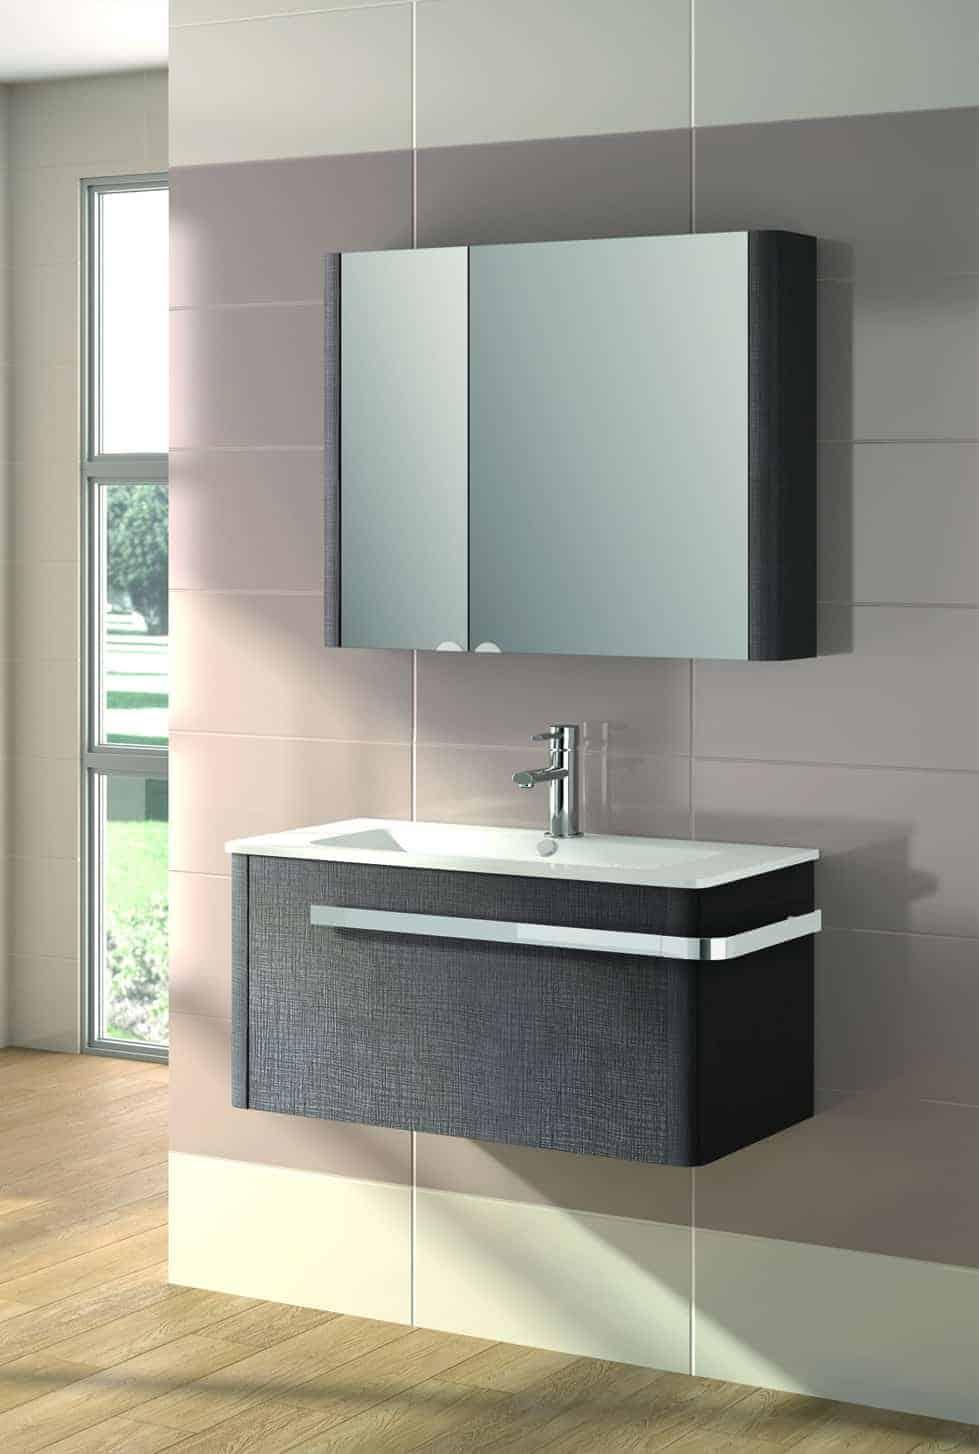 vanite salle de bain ove. Black Bedroom Furniture Sets. Home Design Ideas